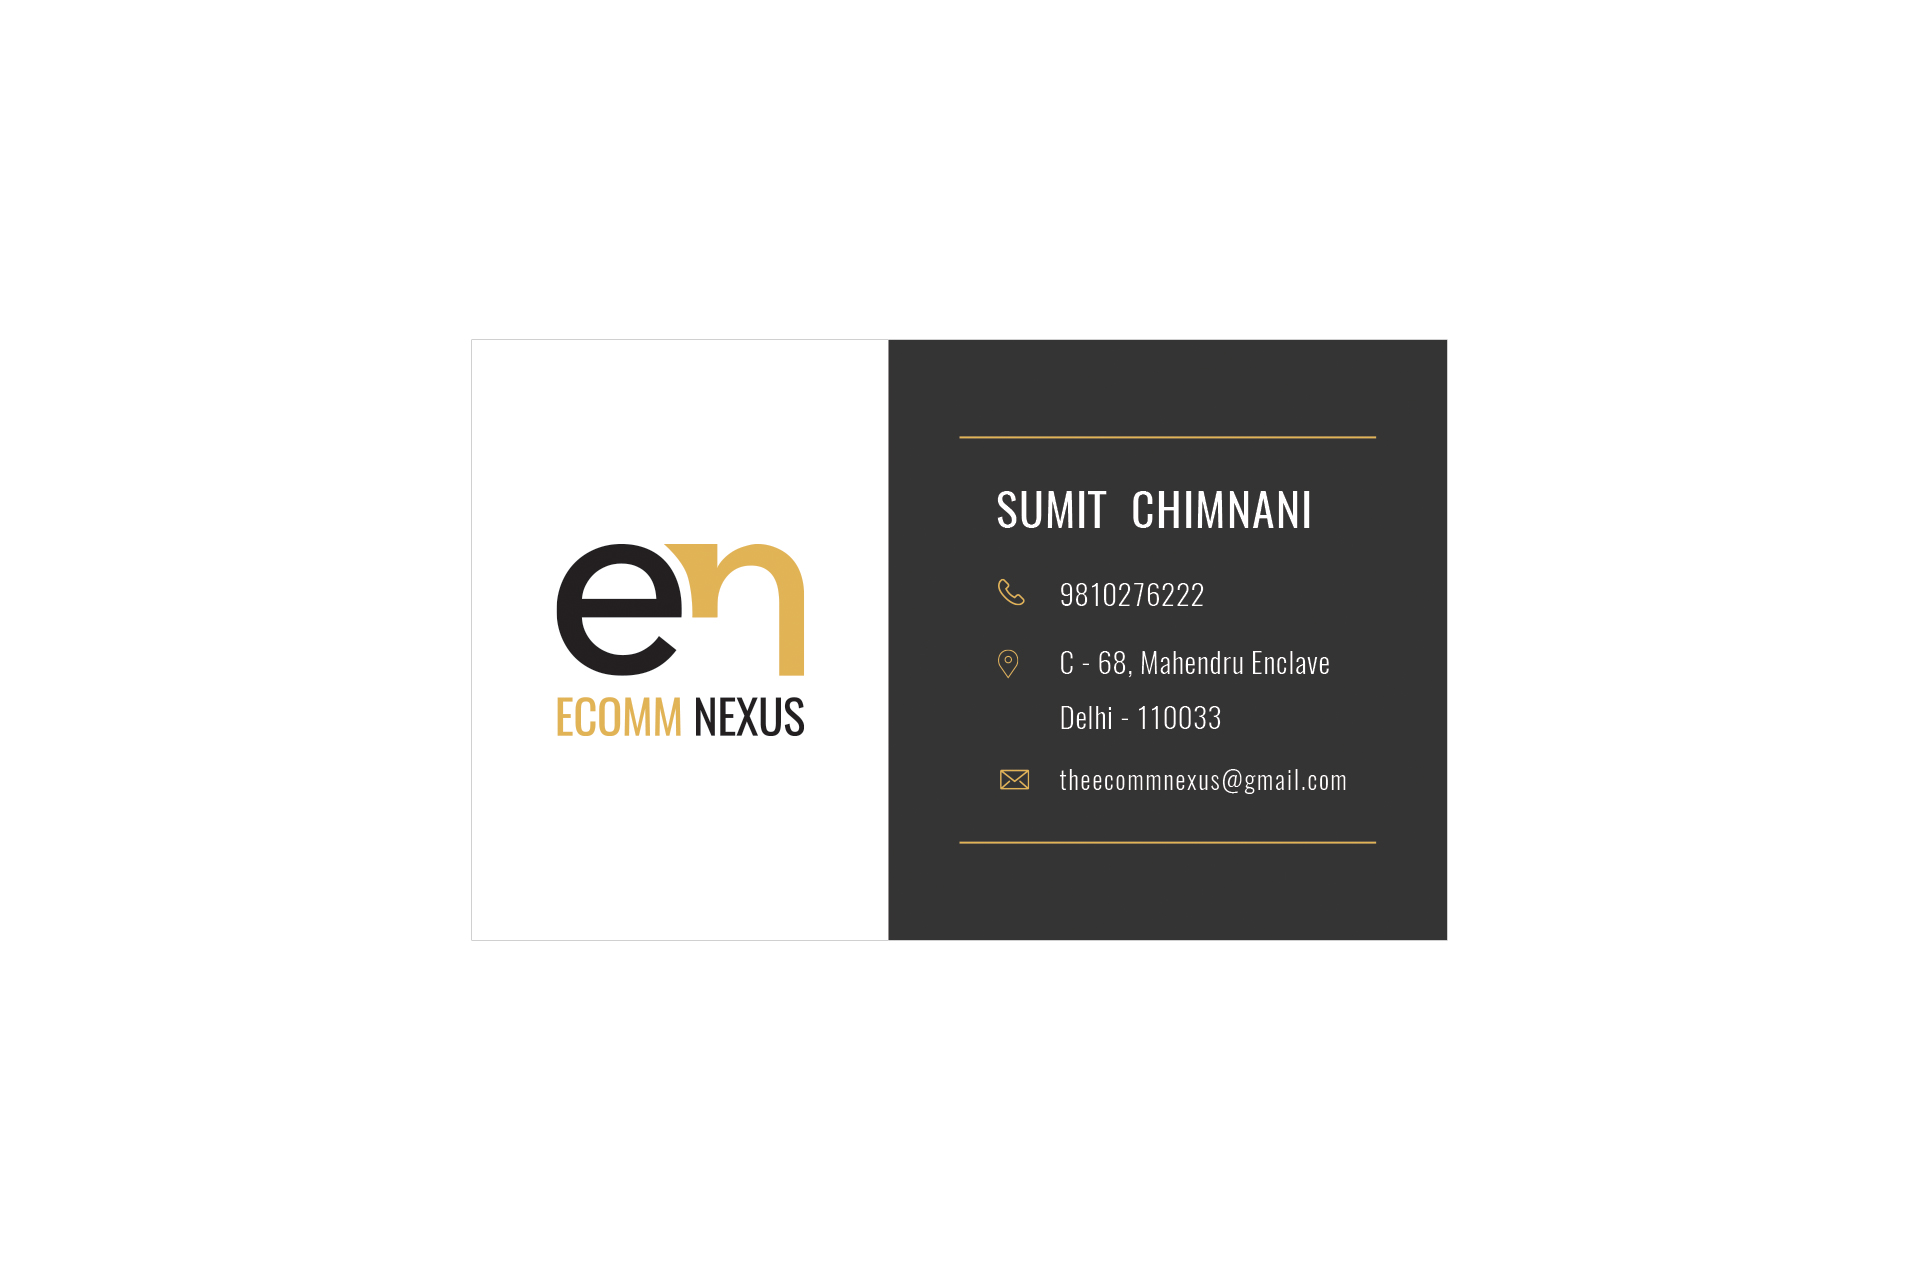 visitingCard-ecomm-nexus